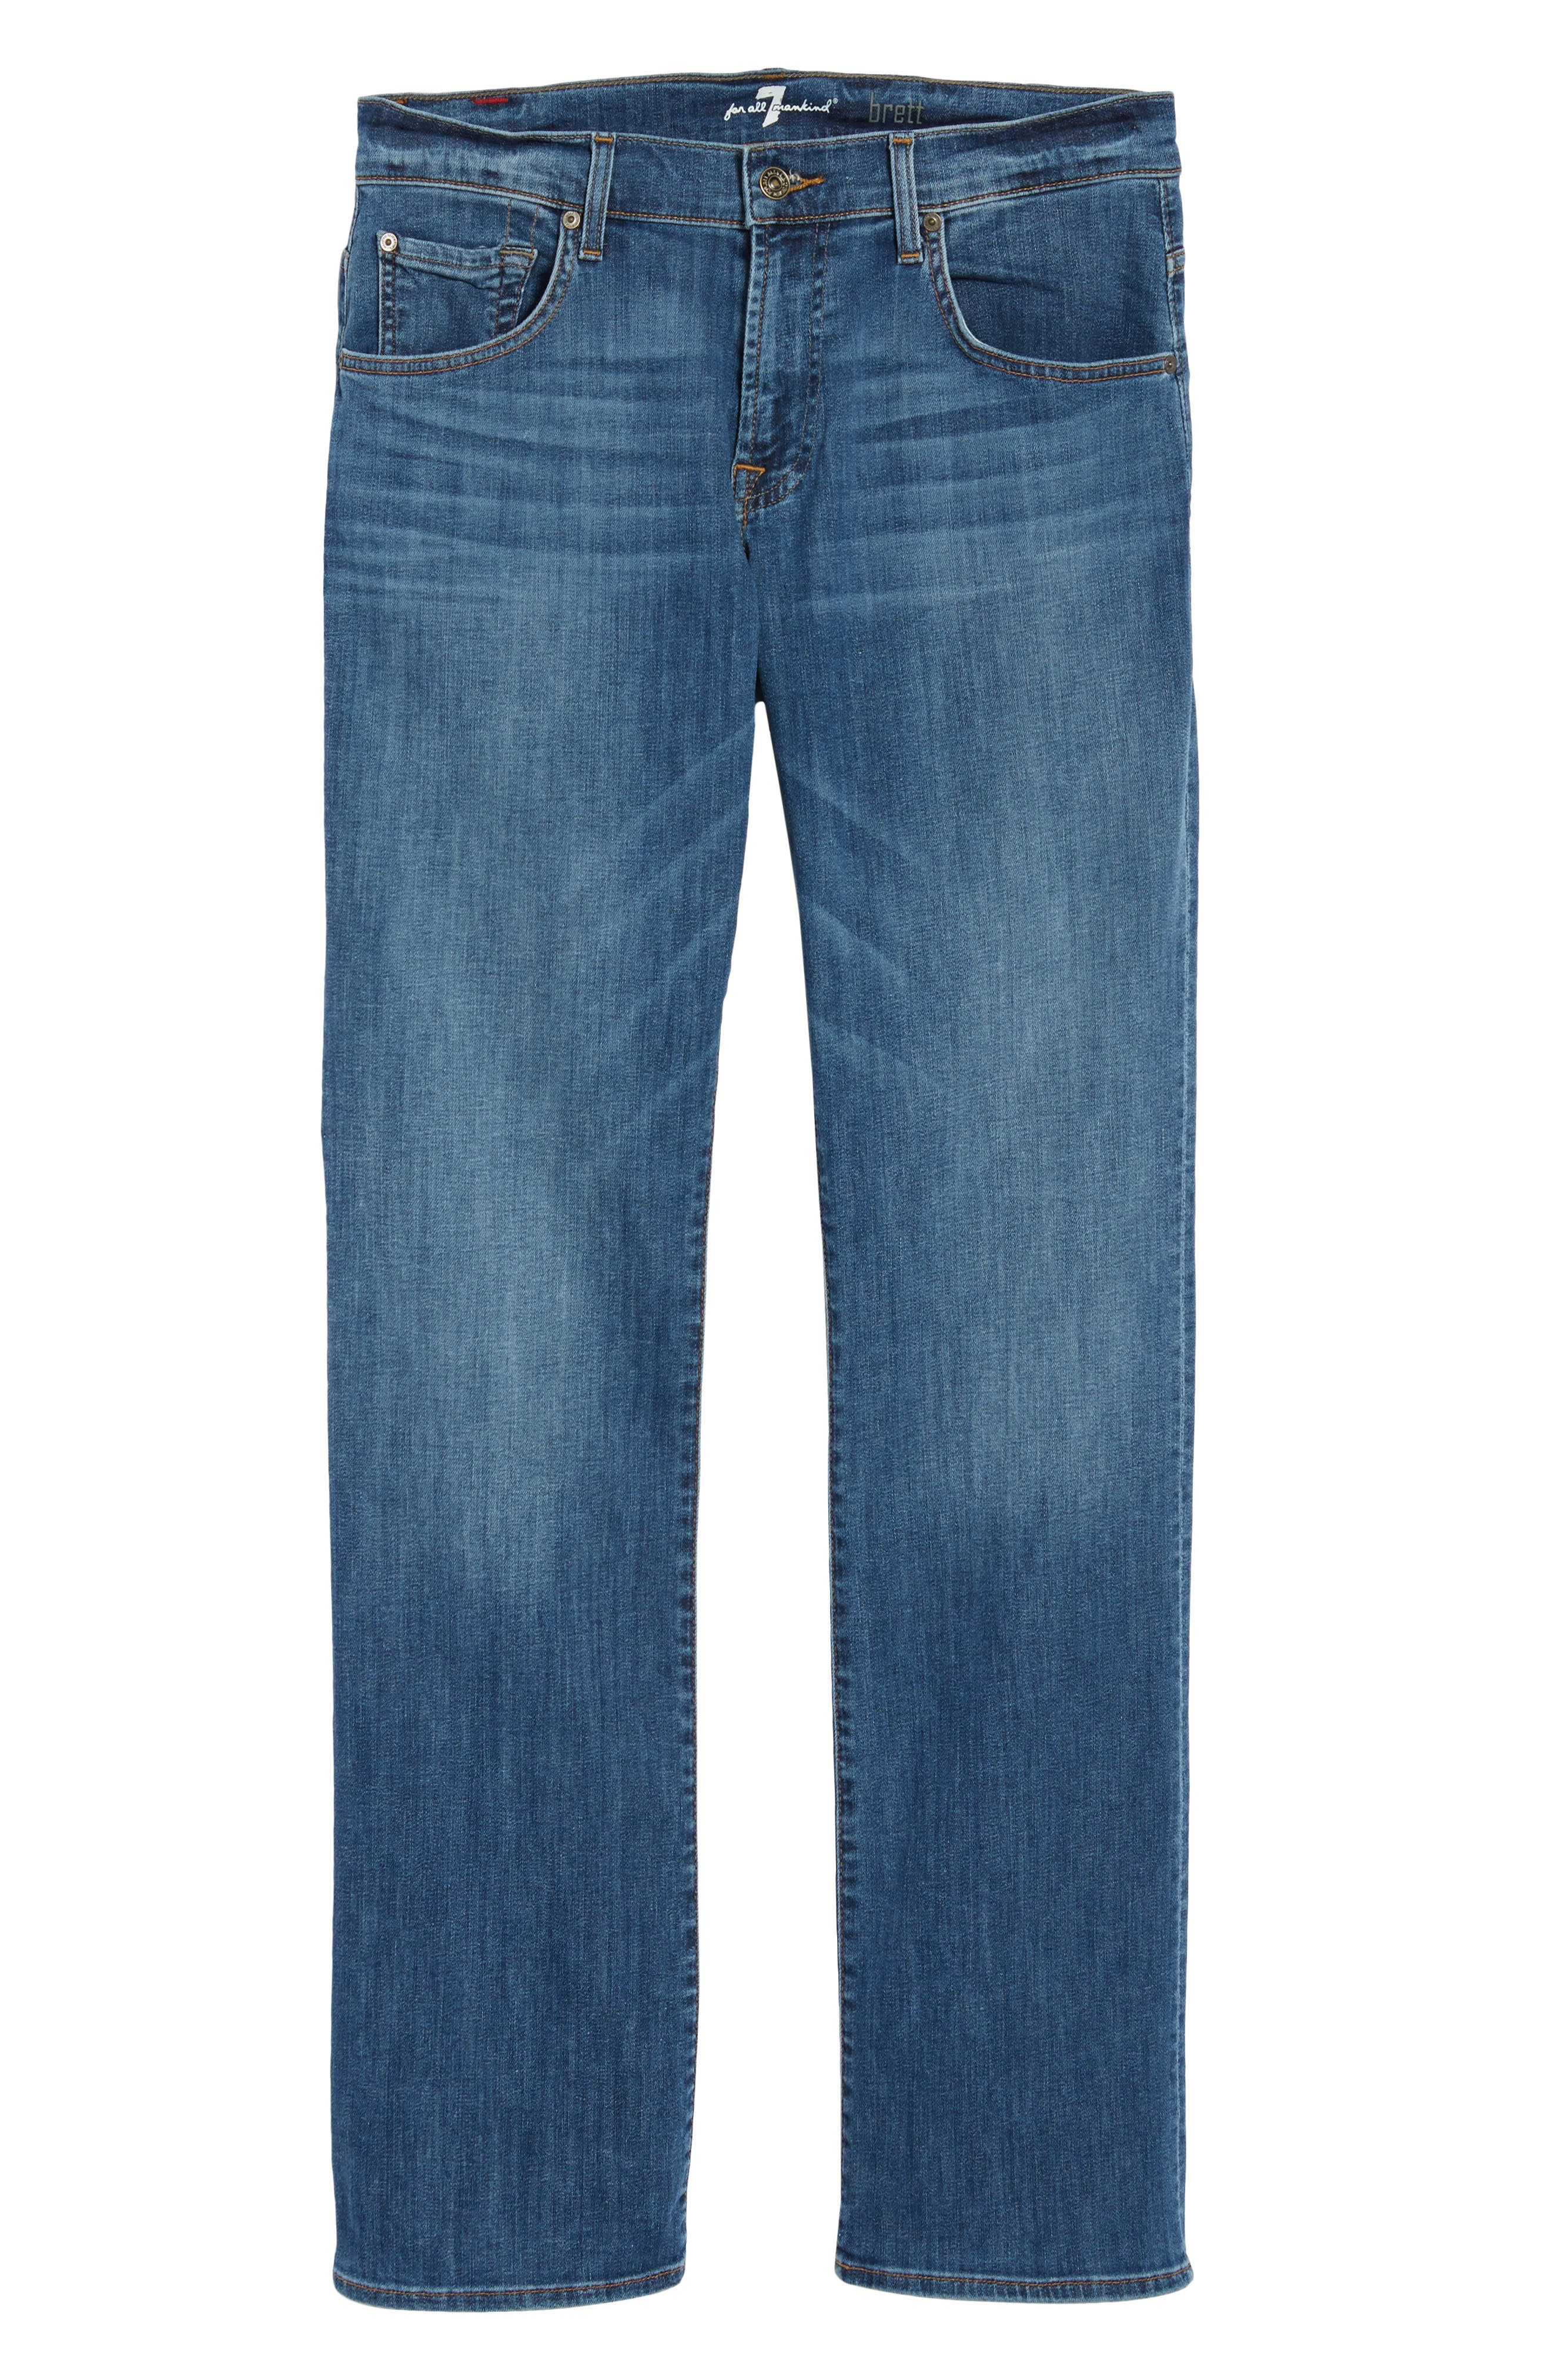 Brett Bootcut Jeans,                             Alternate thumbnail 6, color,                             Aurora